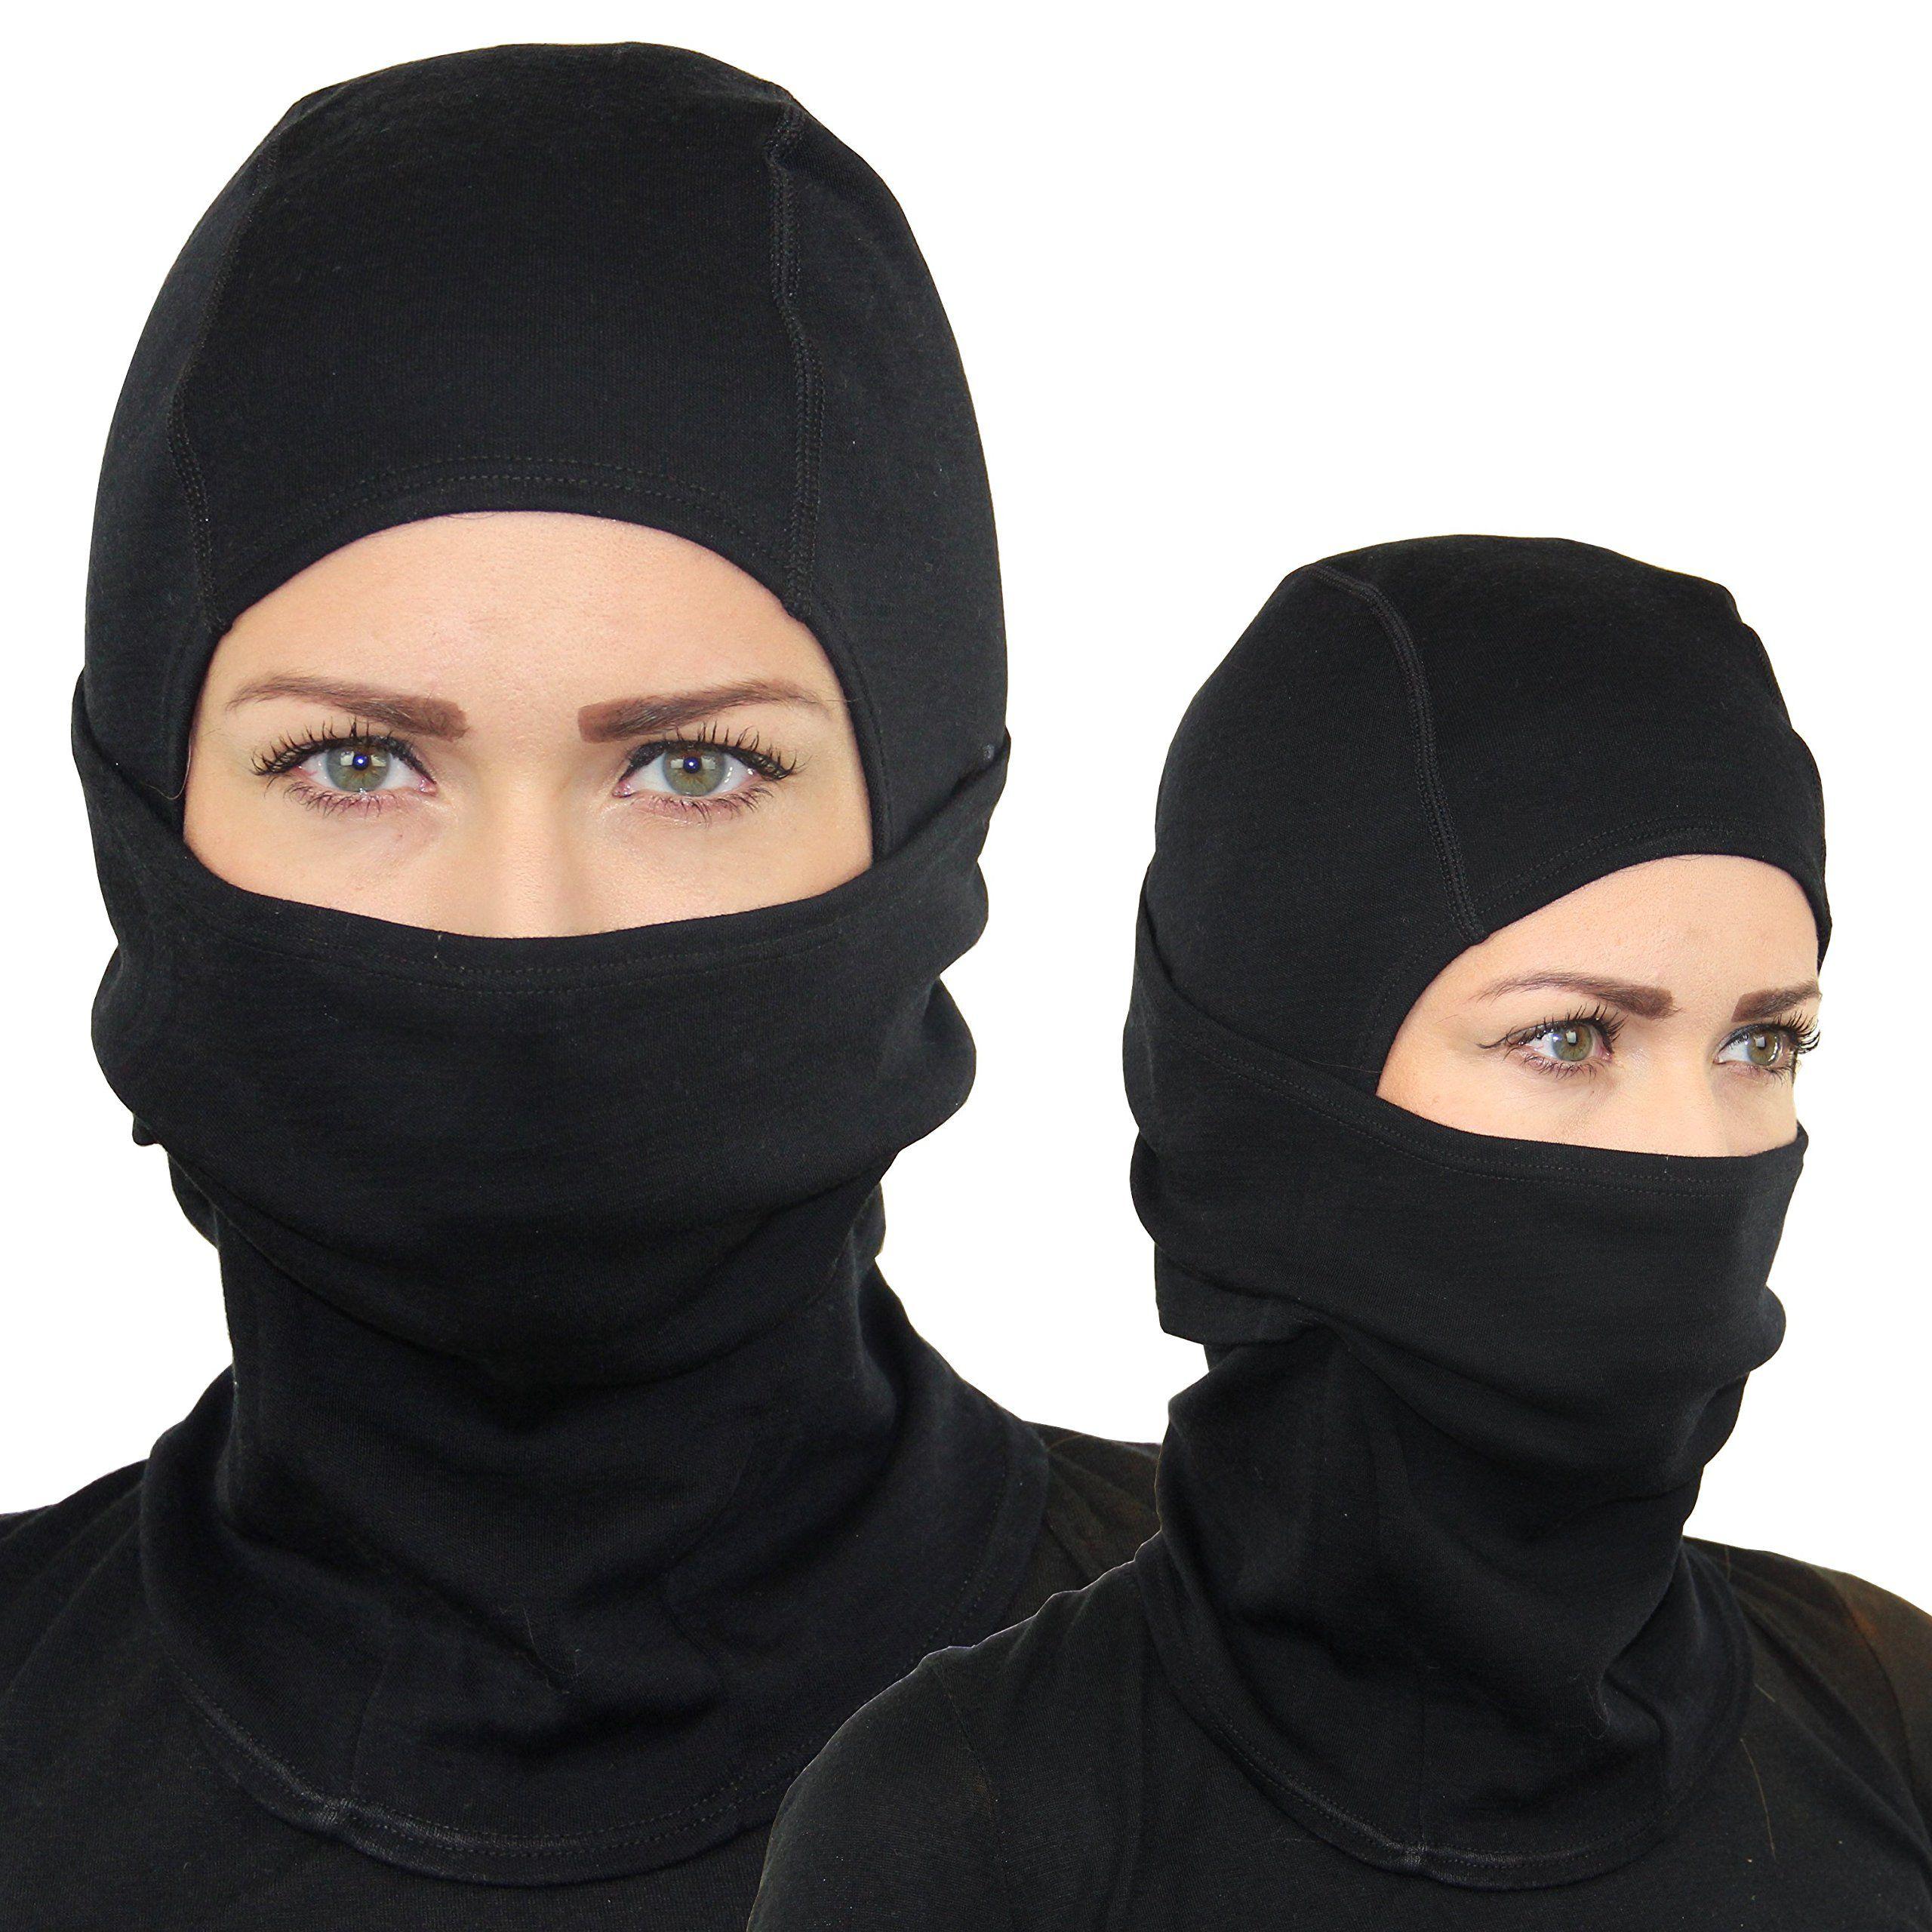 Amazon.com: Merino Wool Hinged Balaclava - Lightweight Ski Mask ...